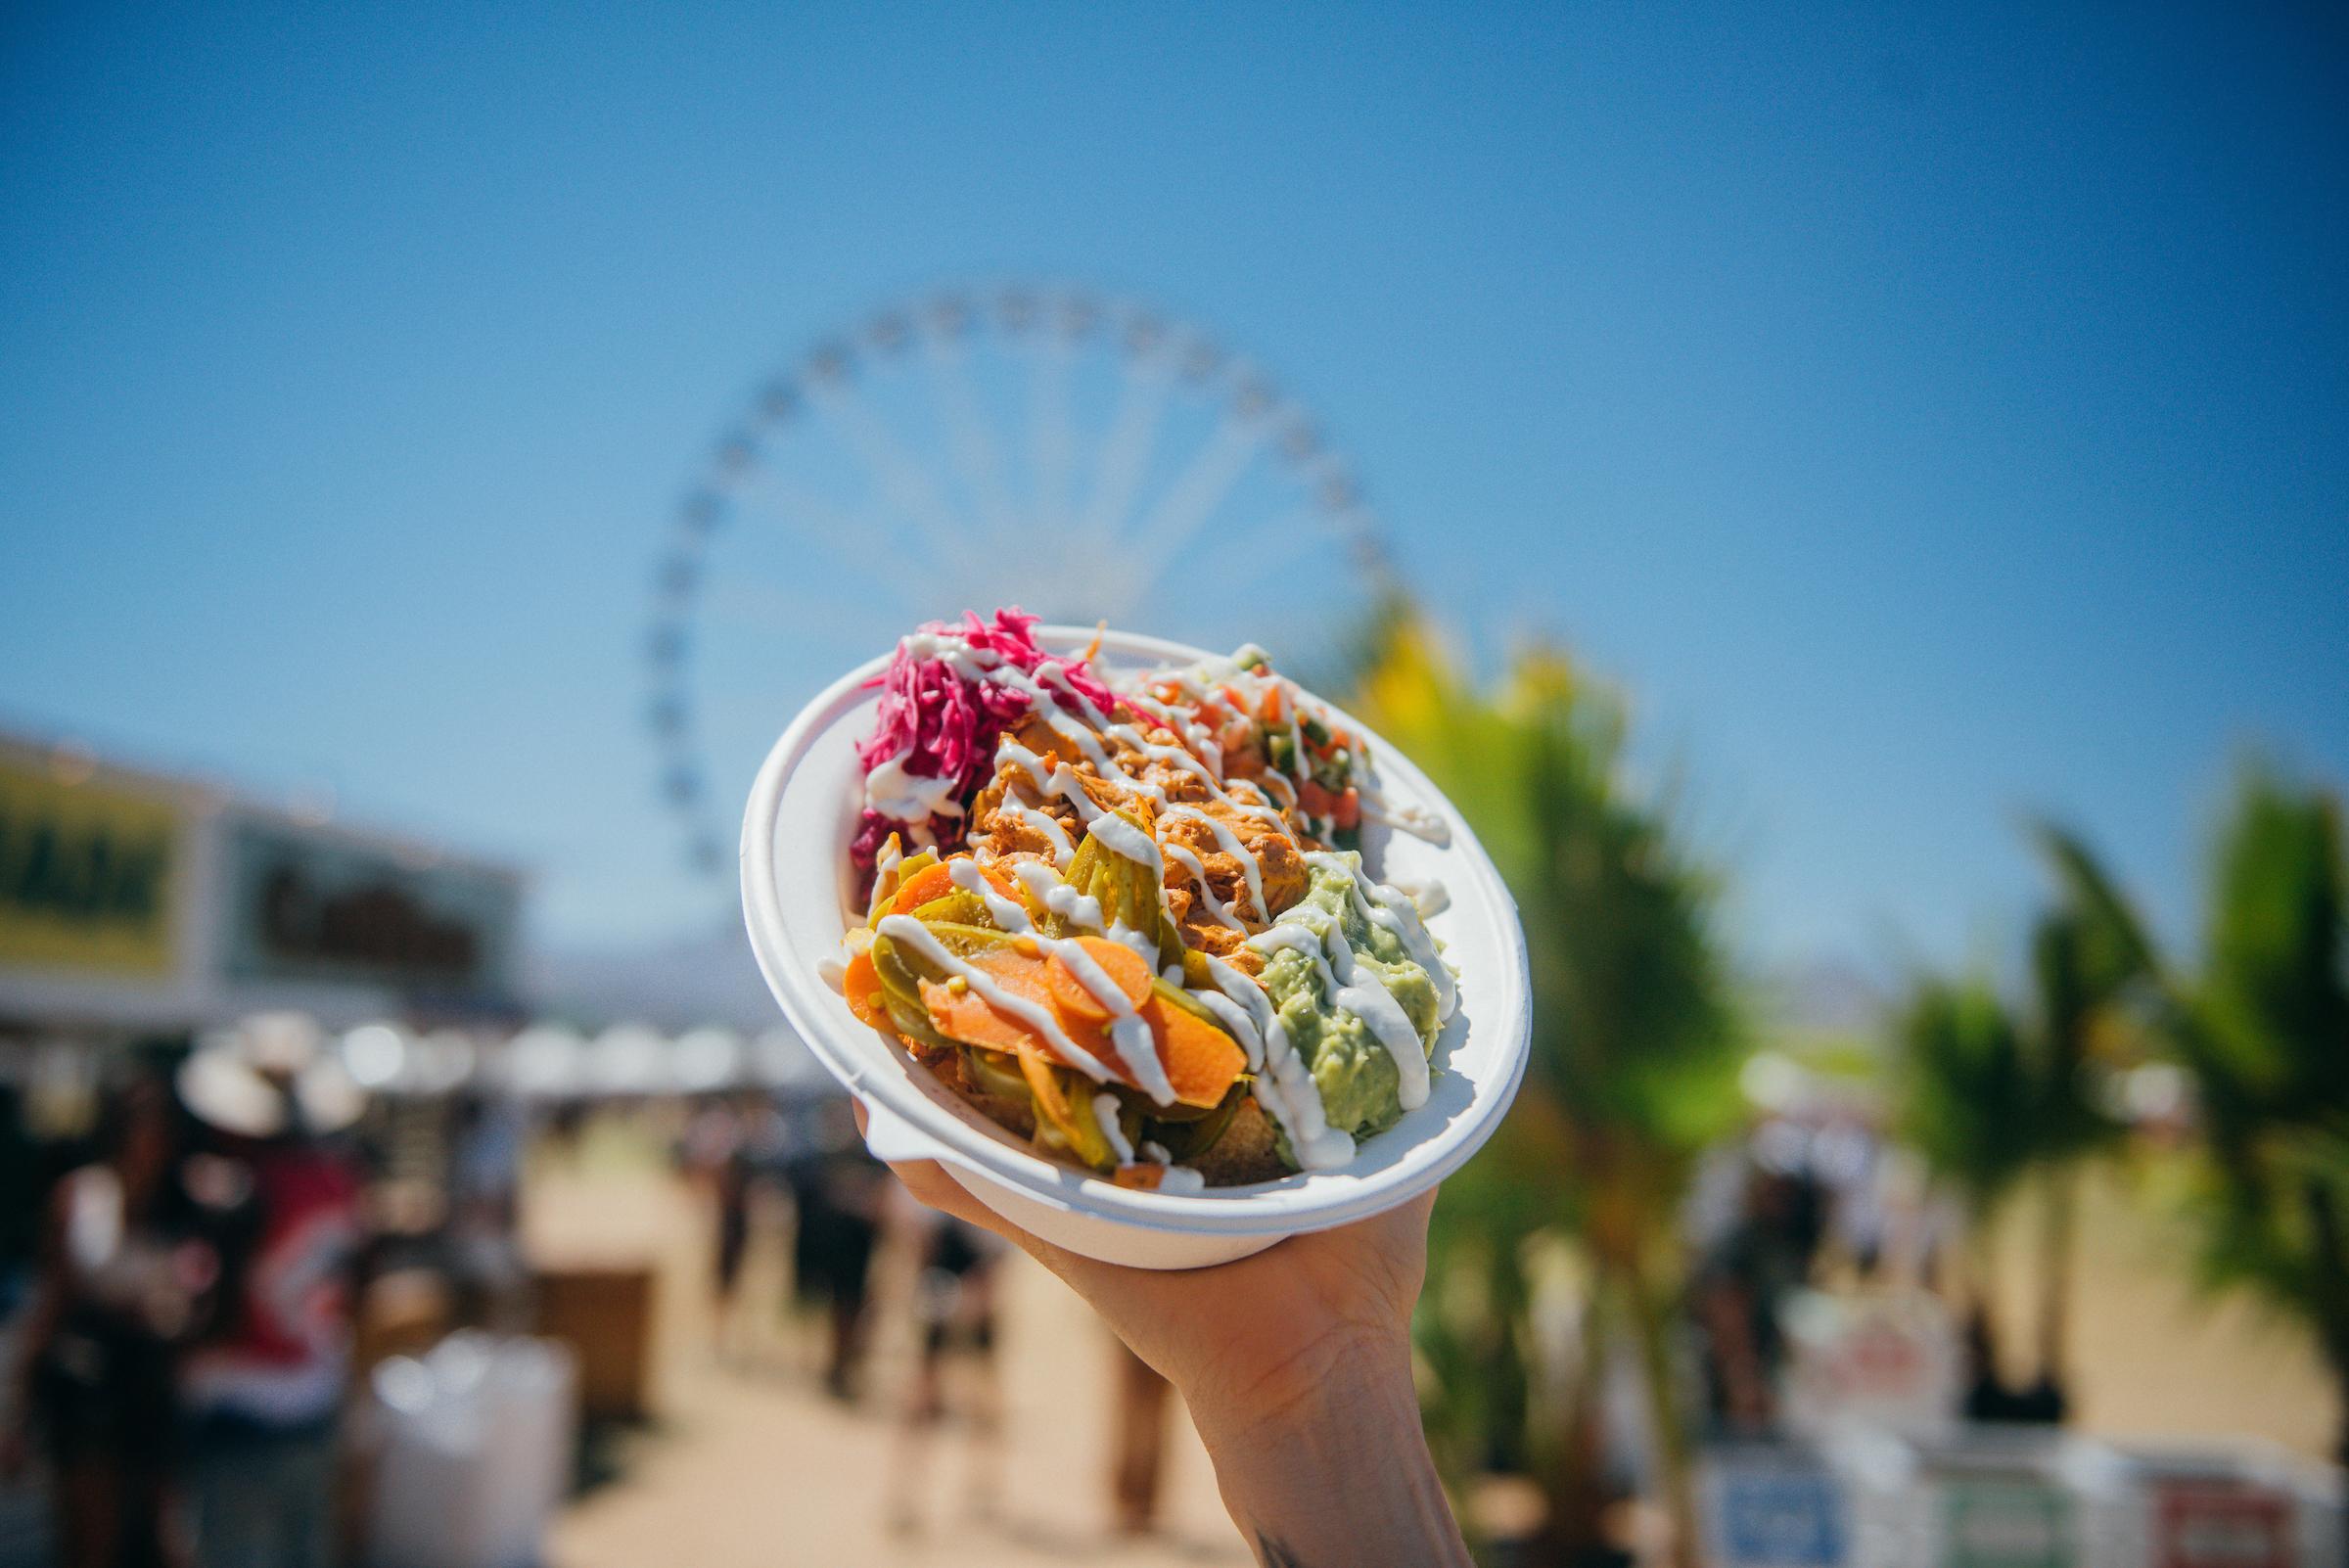 Vegan bowl at Coachella 2018